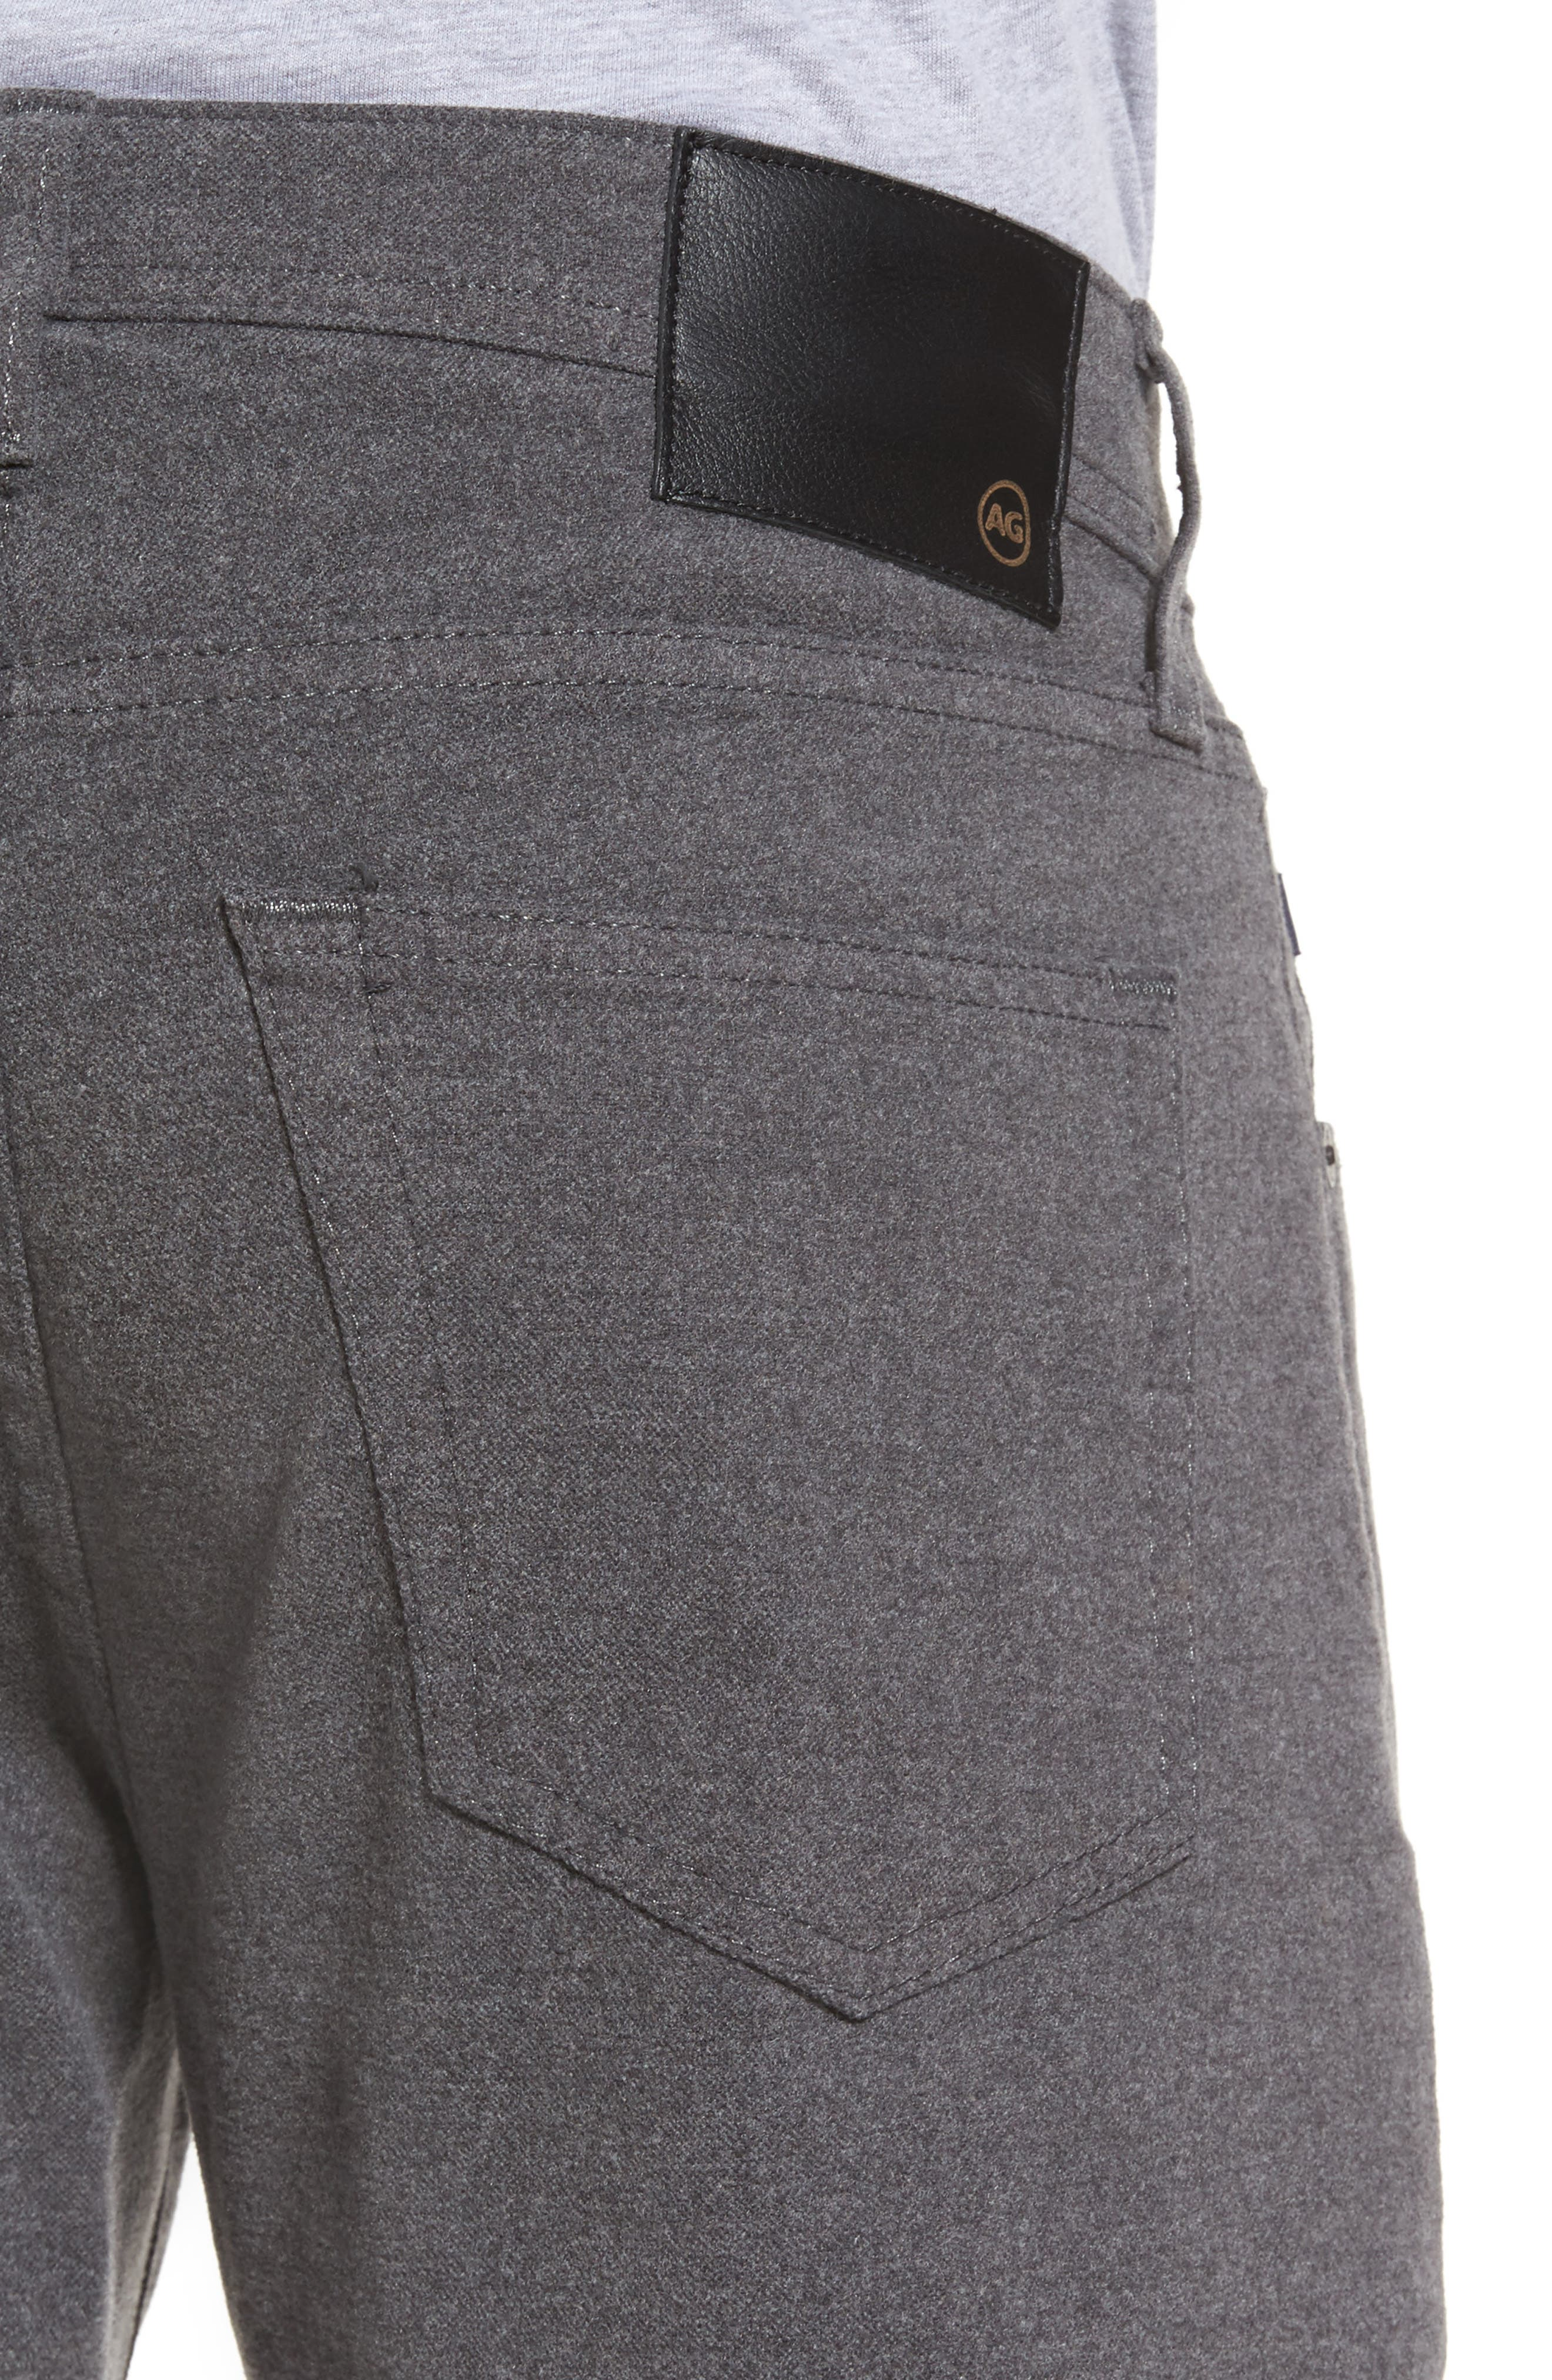 Tellis Slim Fit Five-Pocket Pants,                             Alternate thumbnail 17, color,